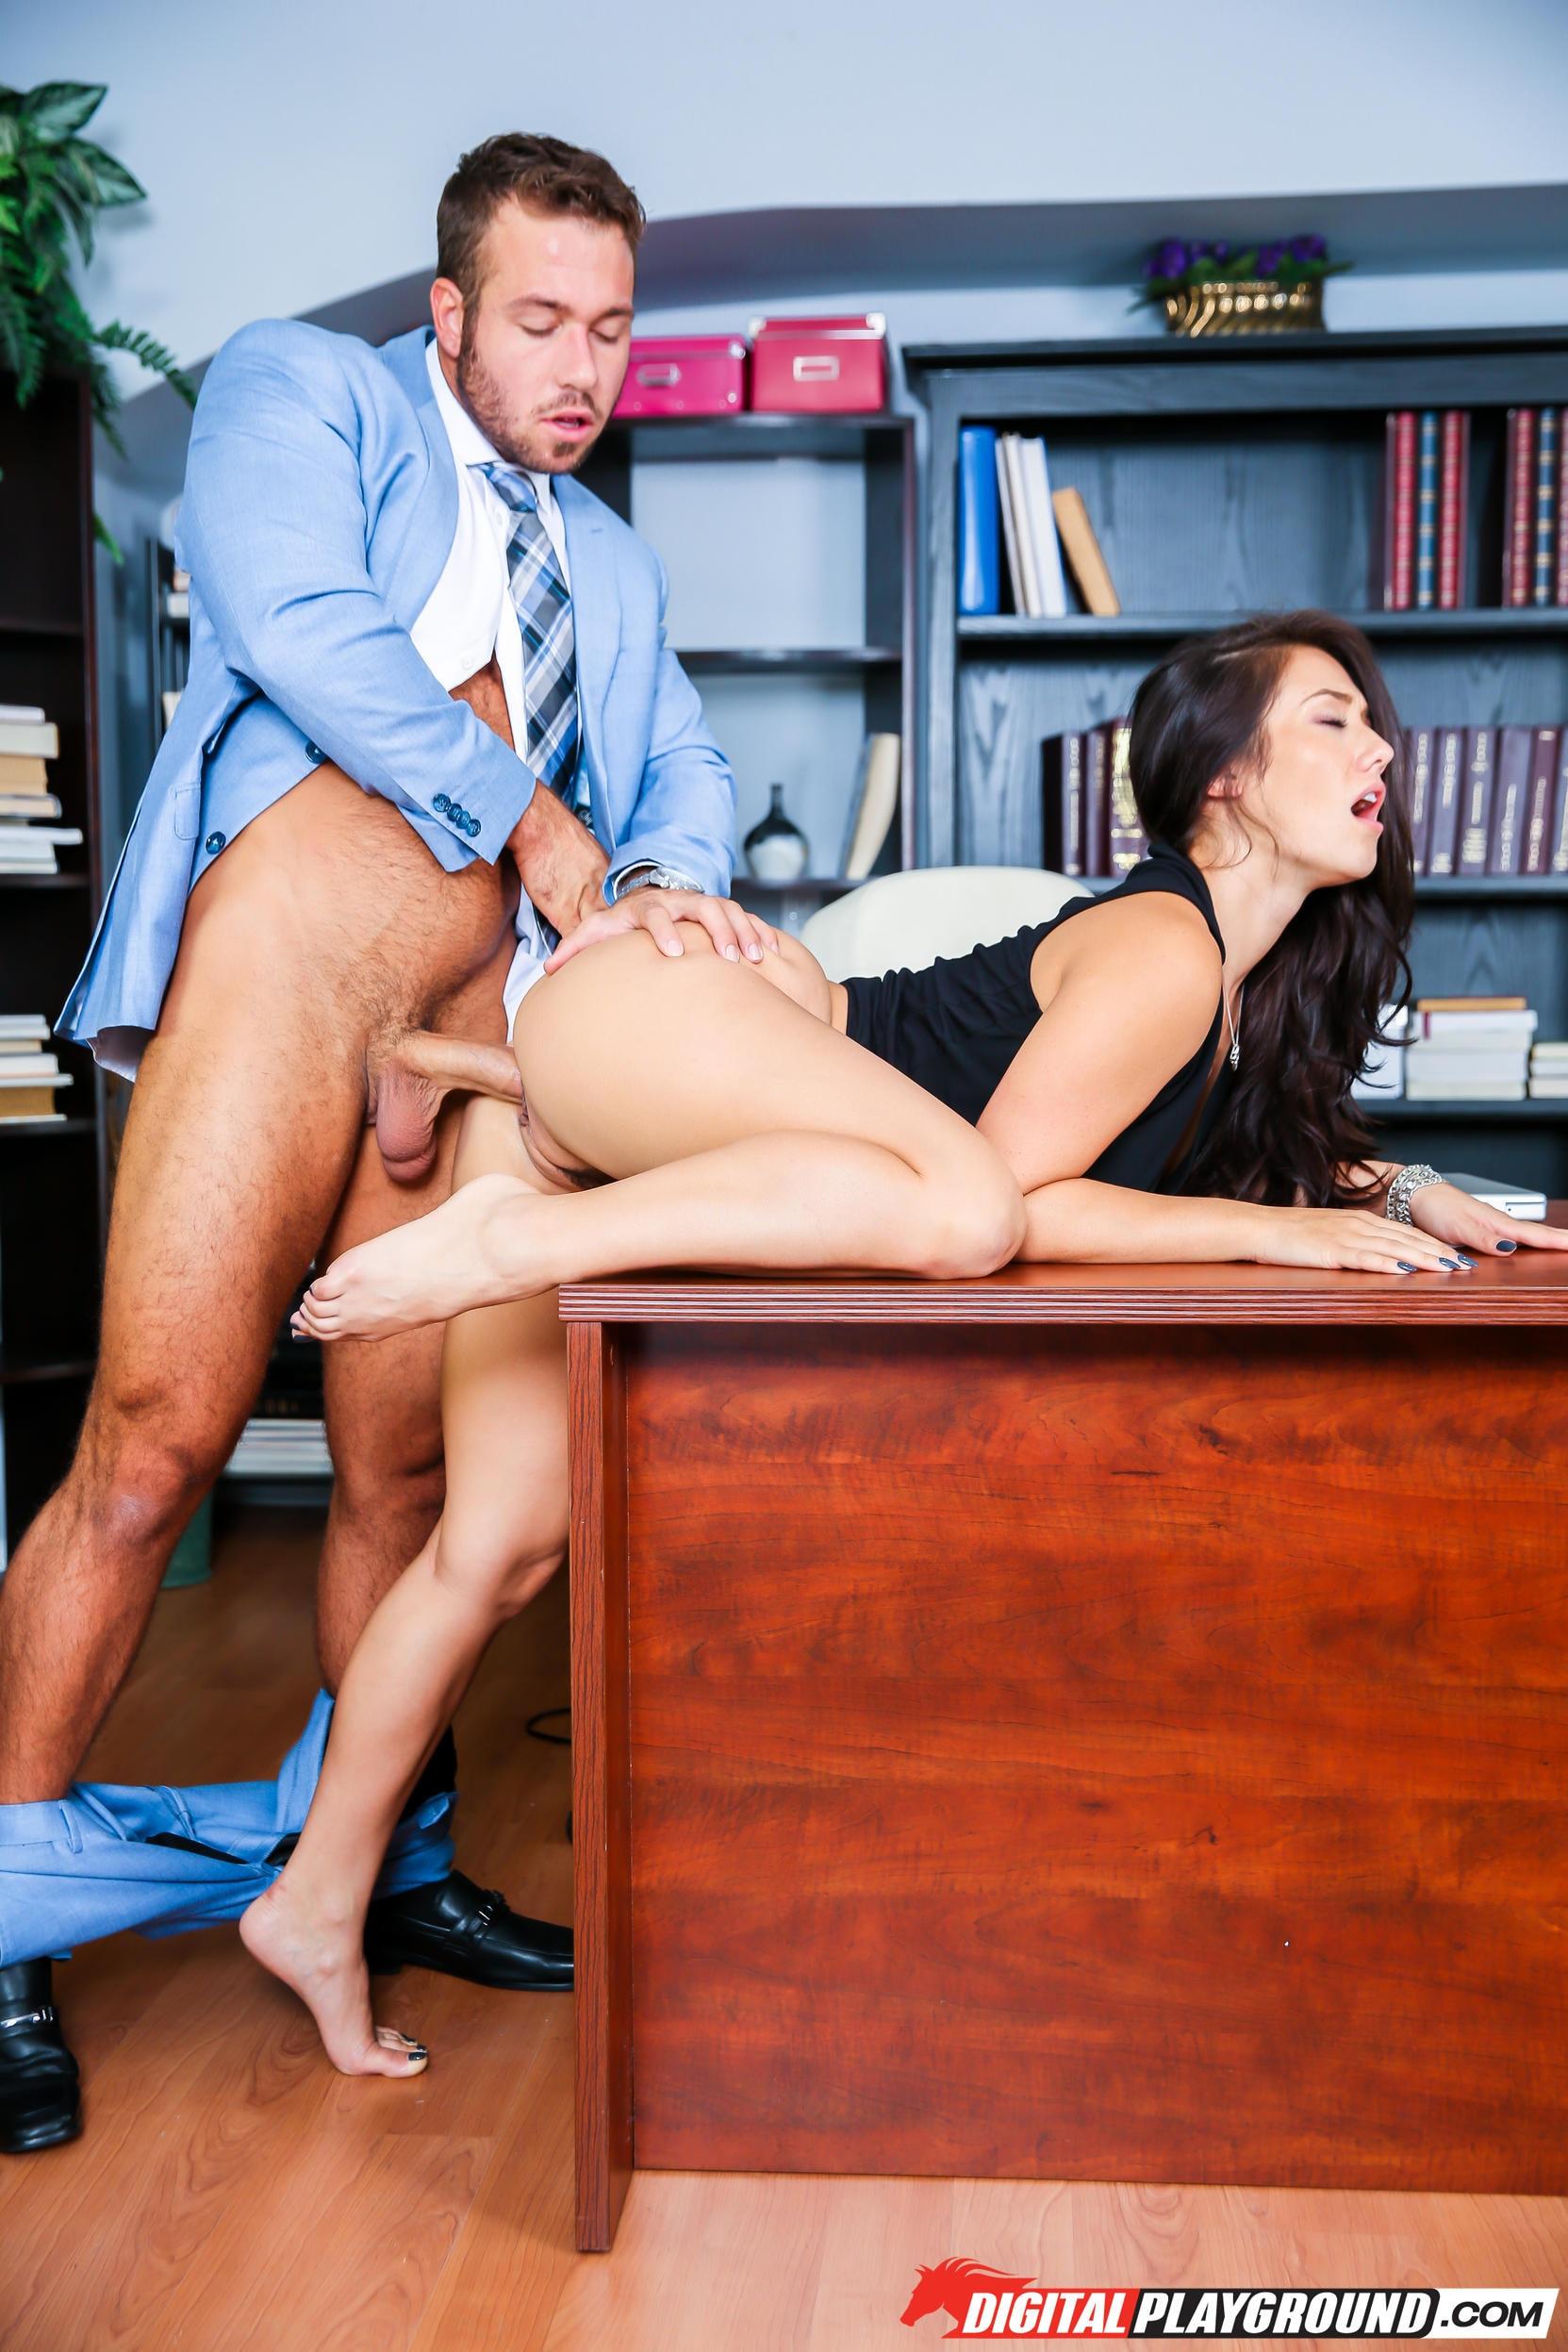 Босс жестко трахнул скромную секретаршу прямо на работе